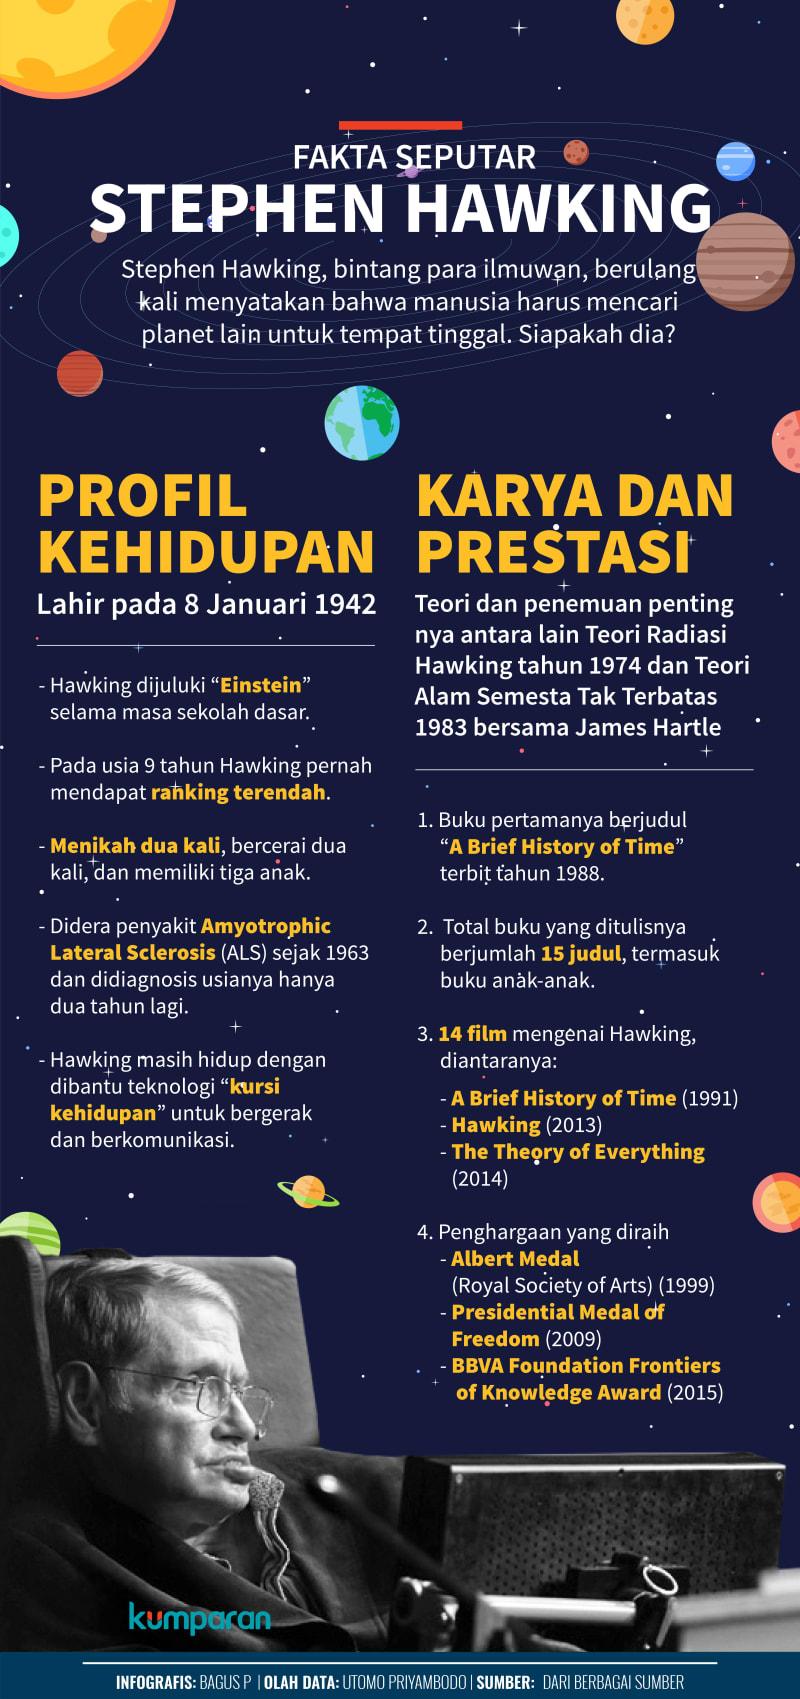 Infografis Profil Stephen Hawking